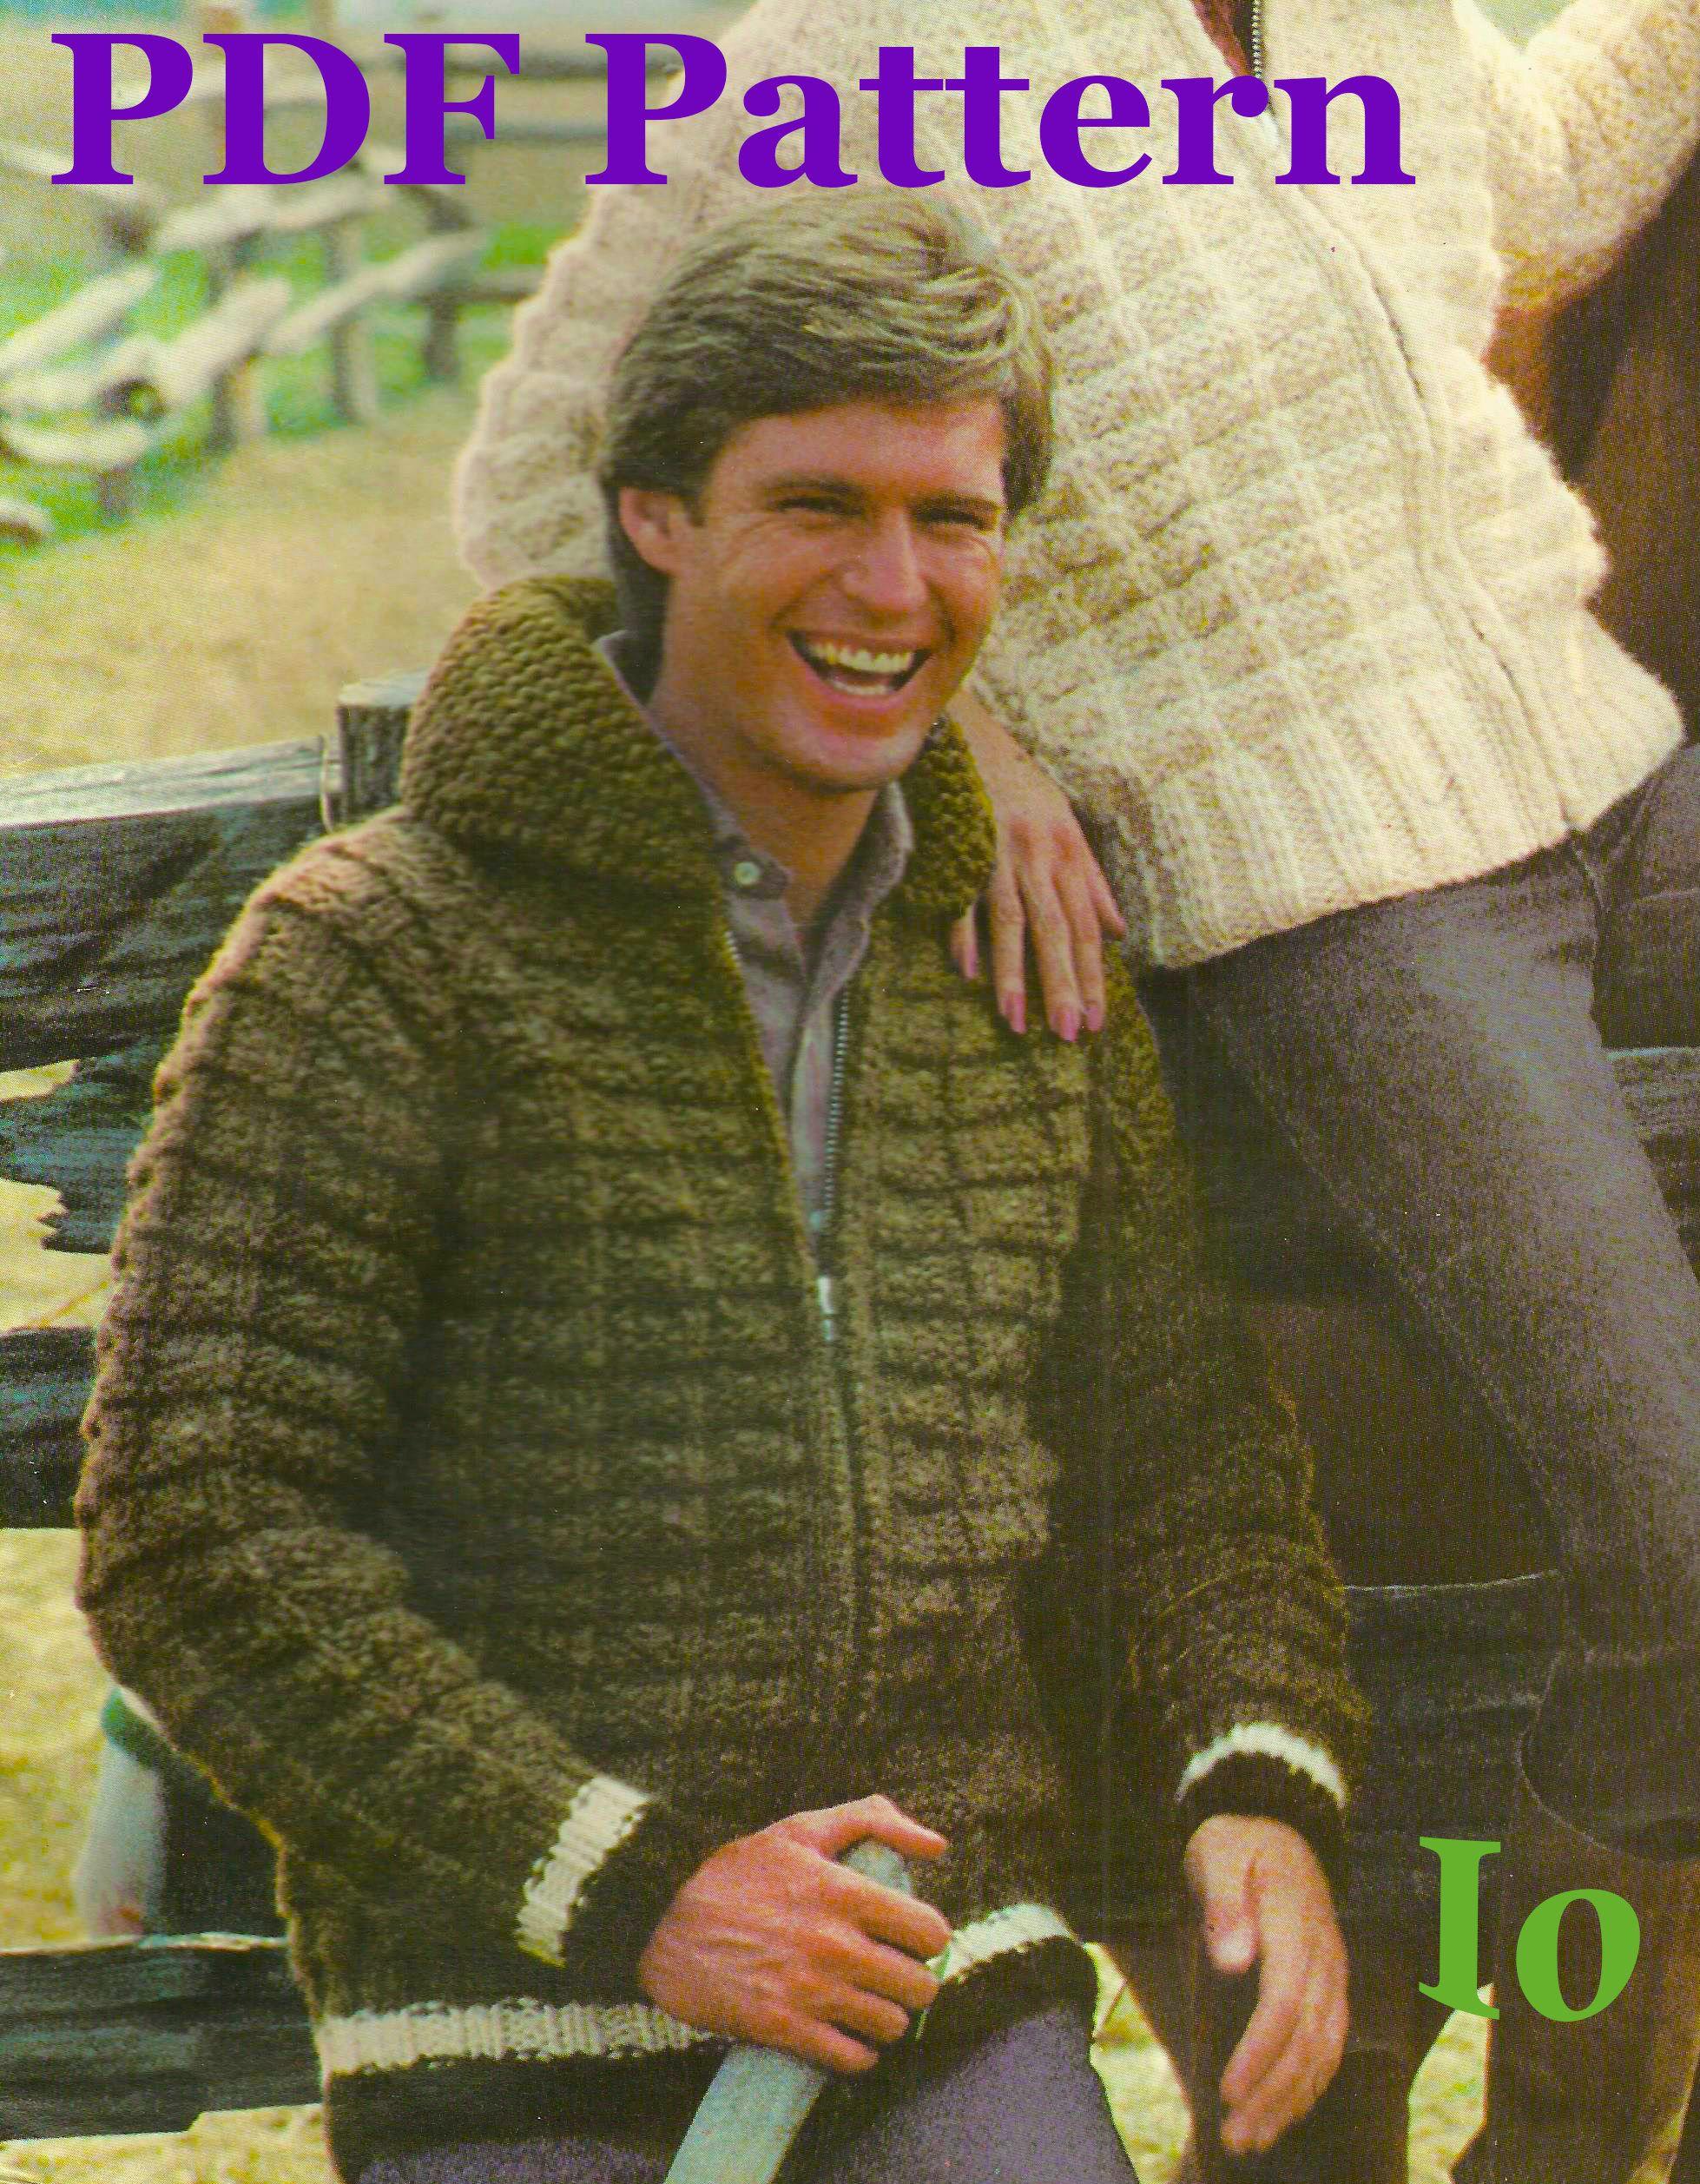 Vintage knitting pattern white buffalo zip up jacket textured vintage knitting pattern white buffalo zip up jacket textured cardigan men bankloansurffo Choice Image